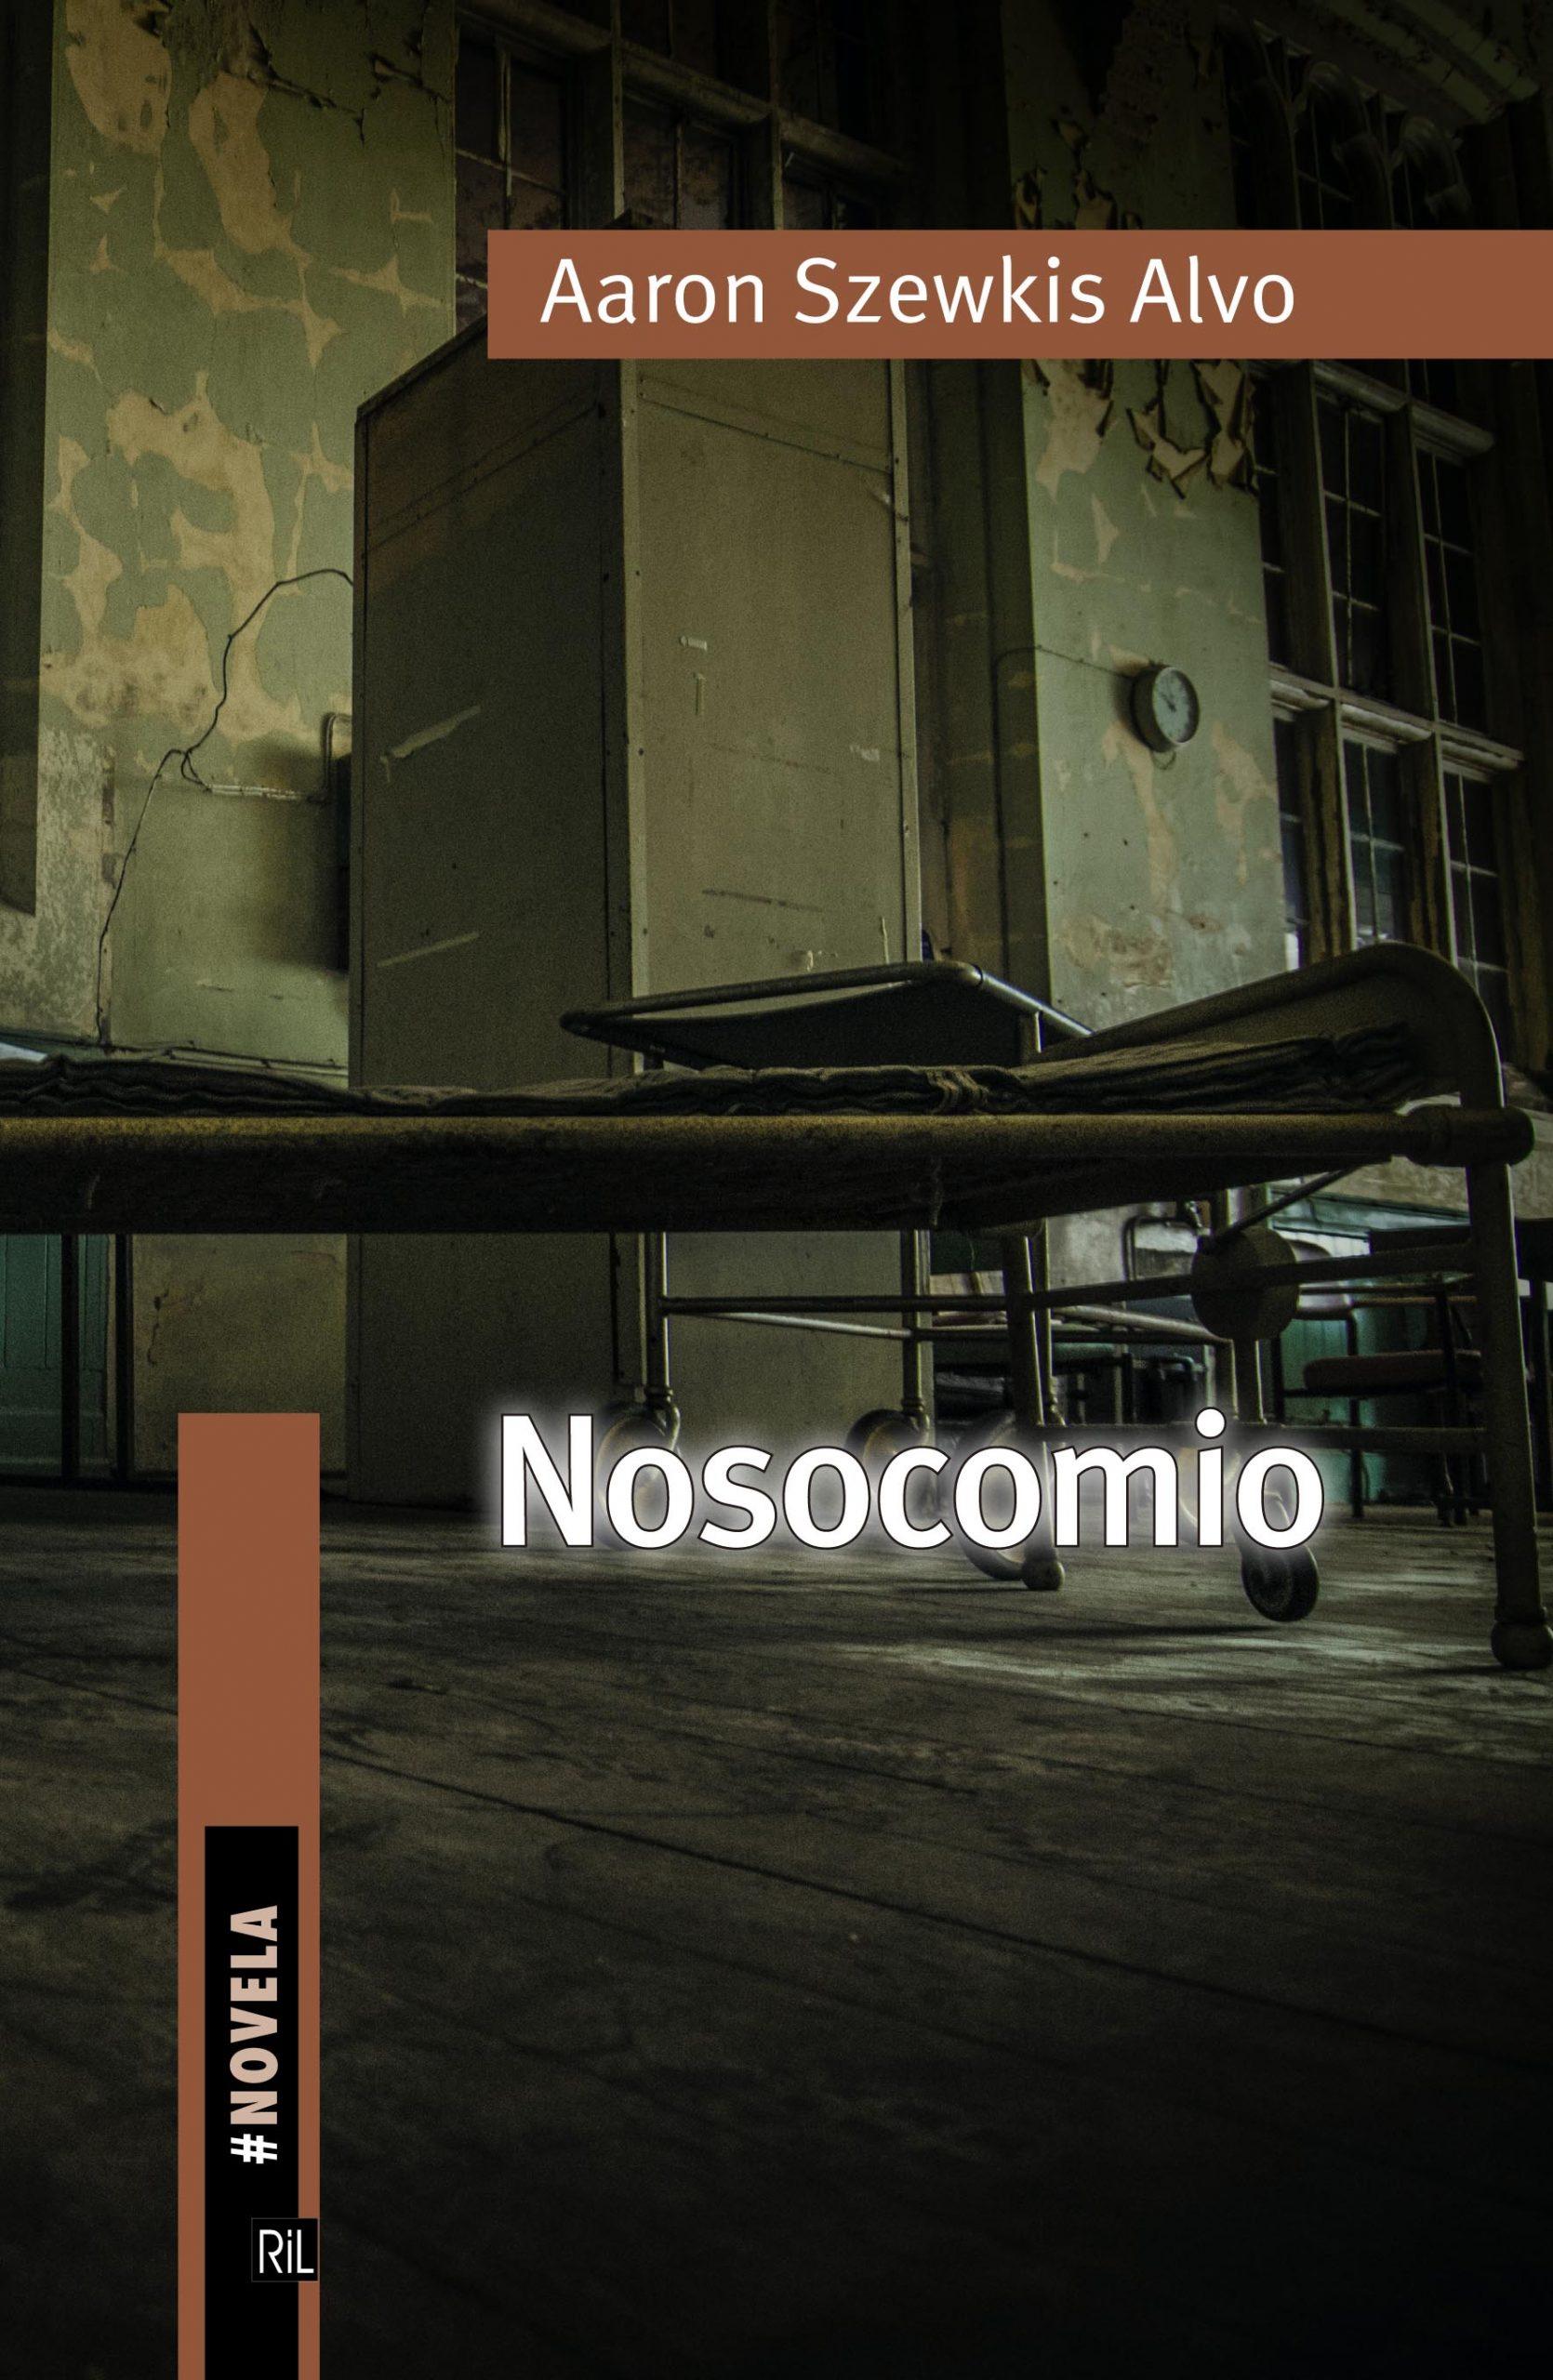 9788418982026-Szewkis-2021-Nosocomio-1-scaled-1.jpg